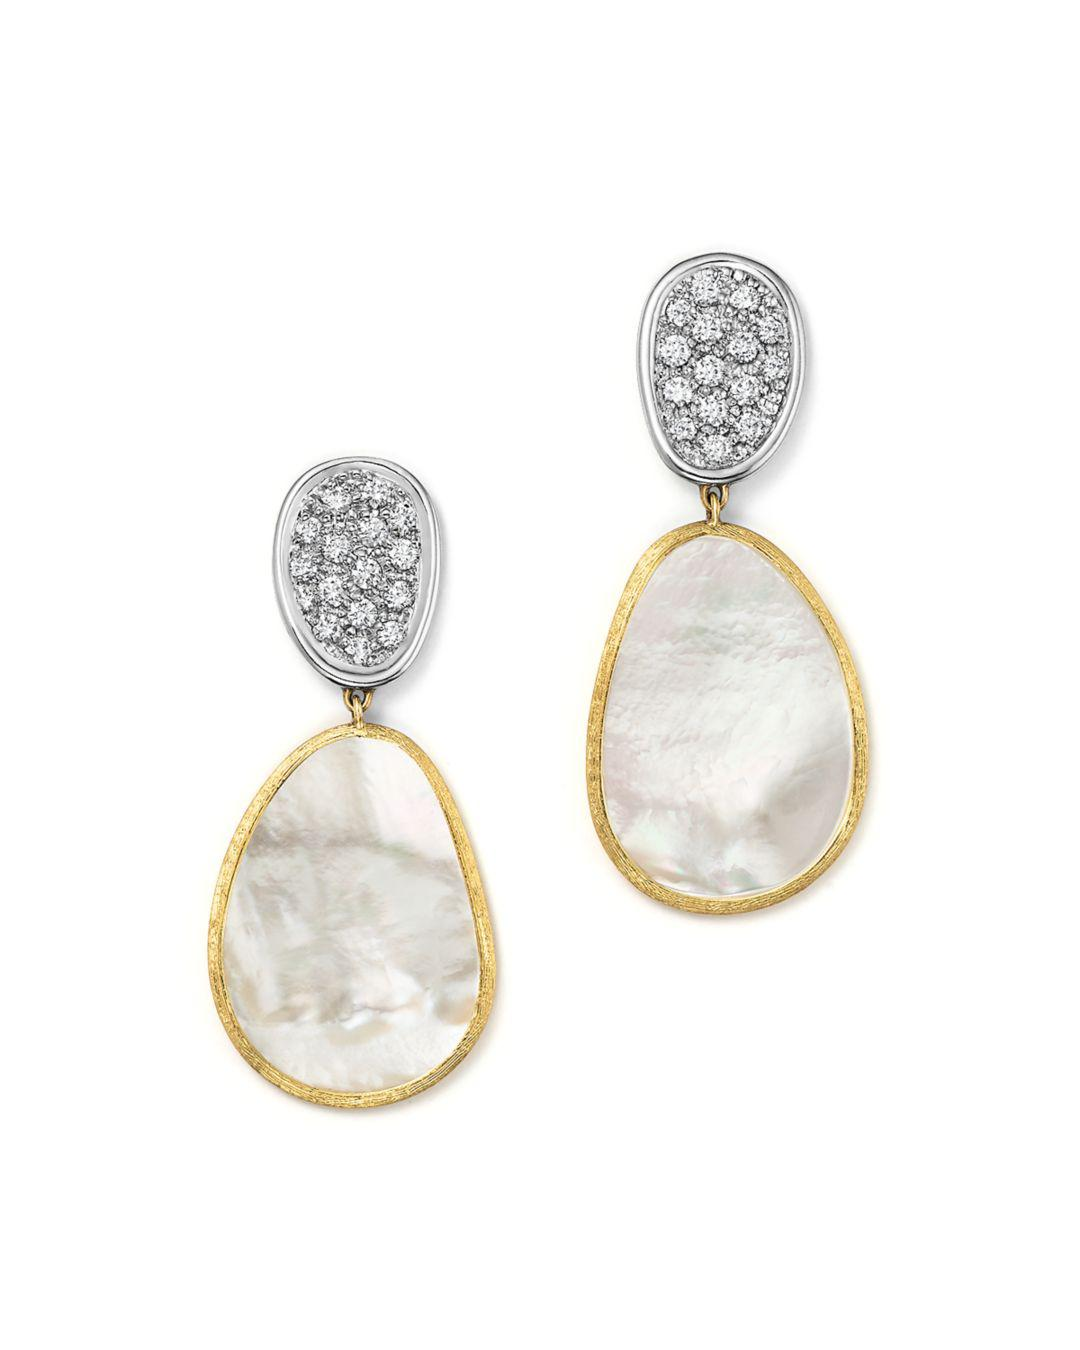 93934b27dd81 Marco Bicego 18k White   Yellow Gold Lunaria Mother-of-pearl Diamond ...